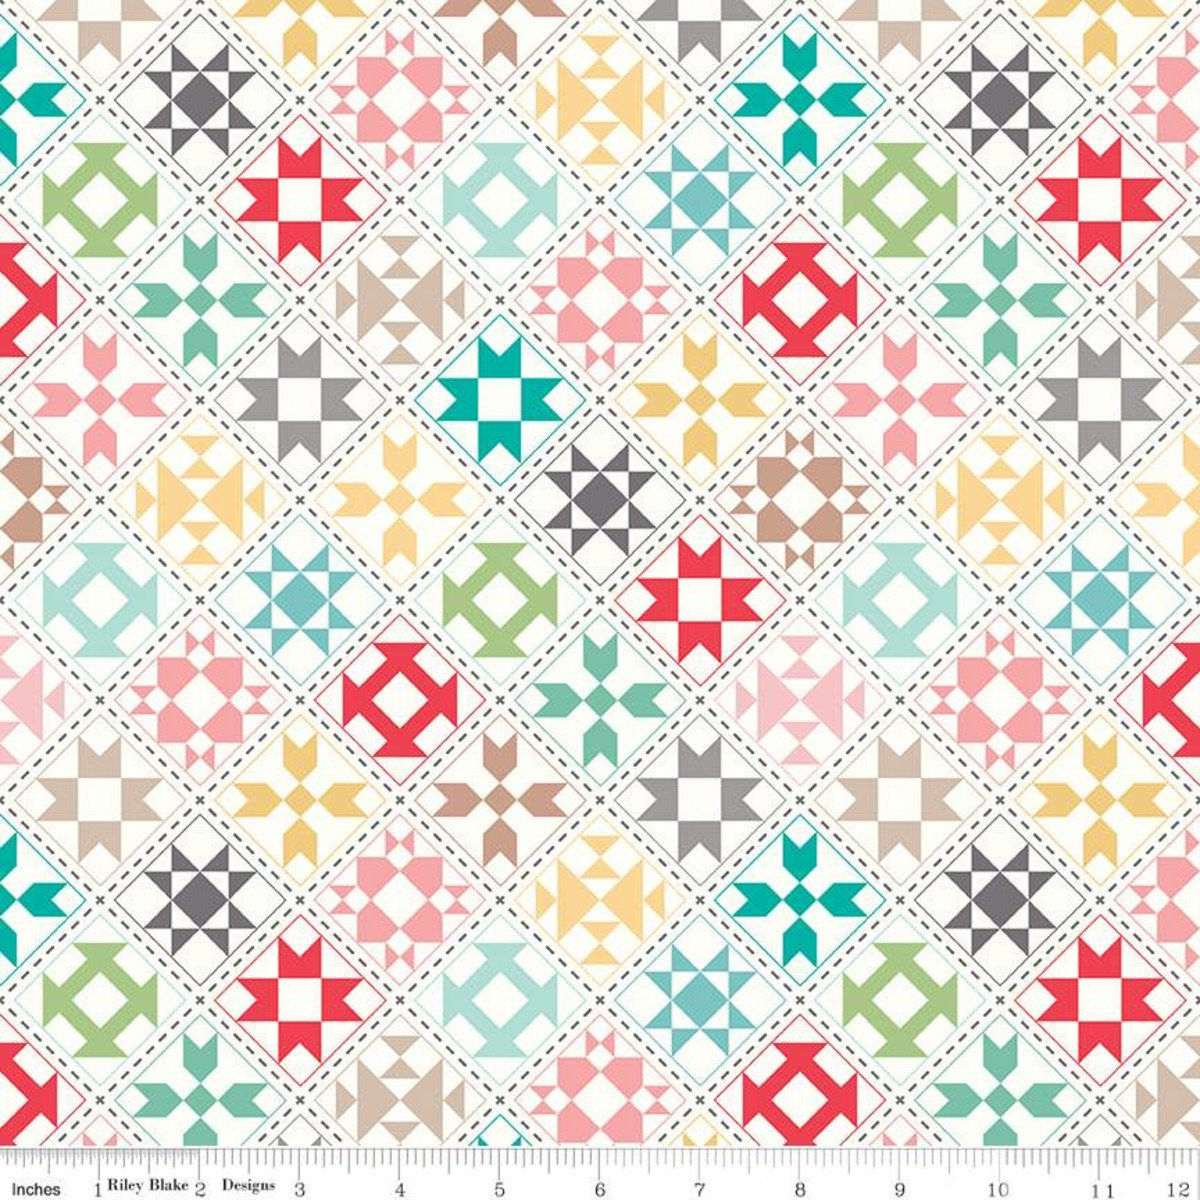 My Happy Place Home D?cor Quilt Blocks Cream